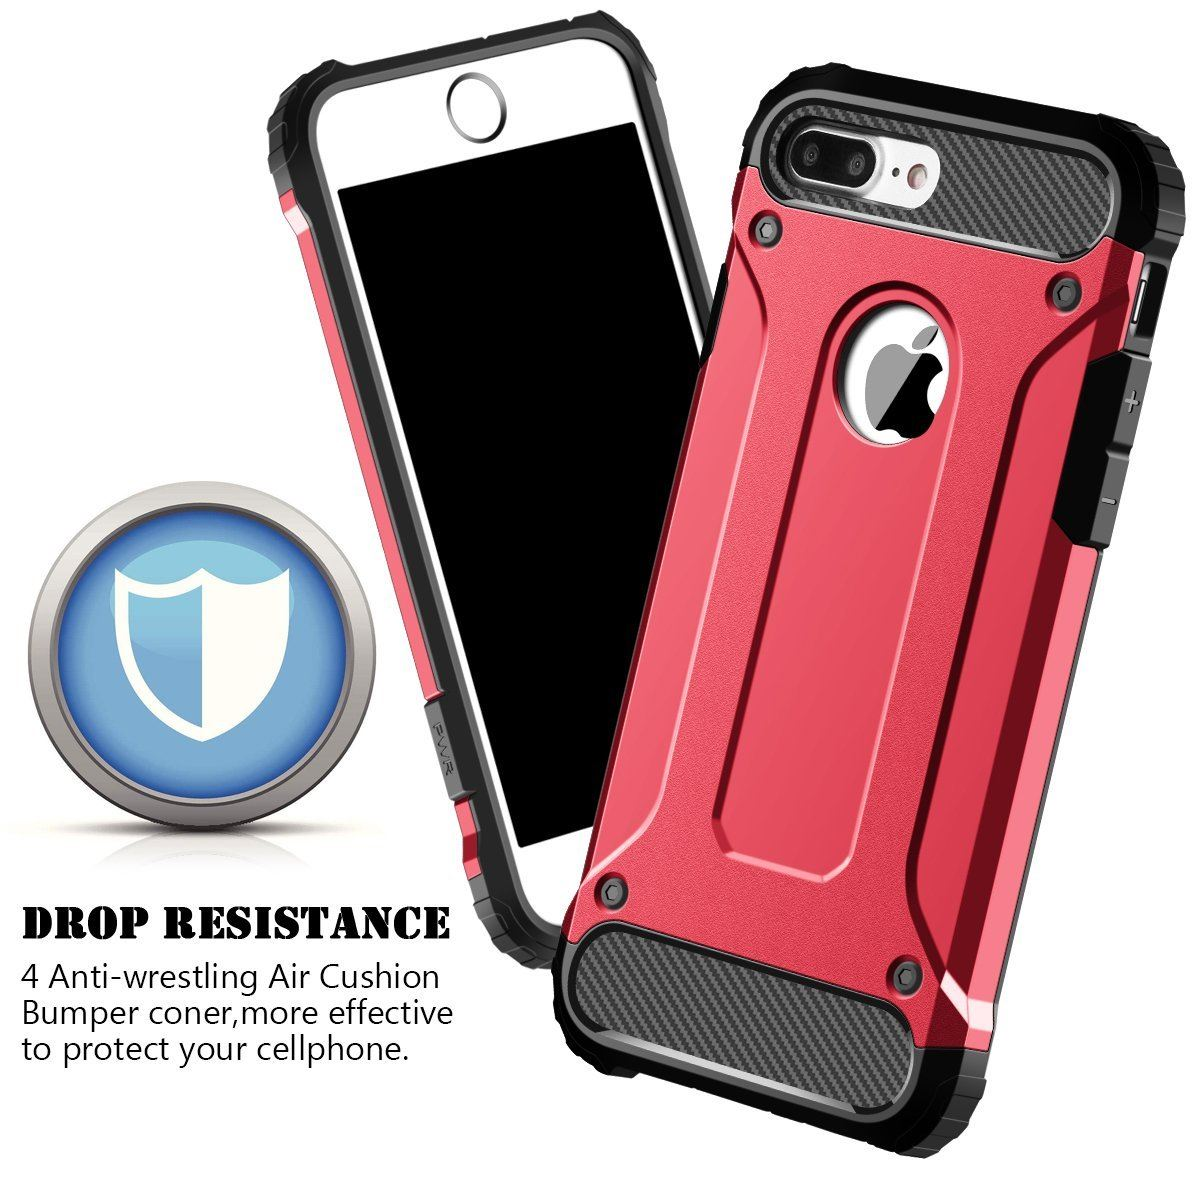 thumbnail 70 - For Apple iPhone 11 Pro Max XR Xs X 8 7 Plus 6 5 Se Case Cover Impact Heavy Duty